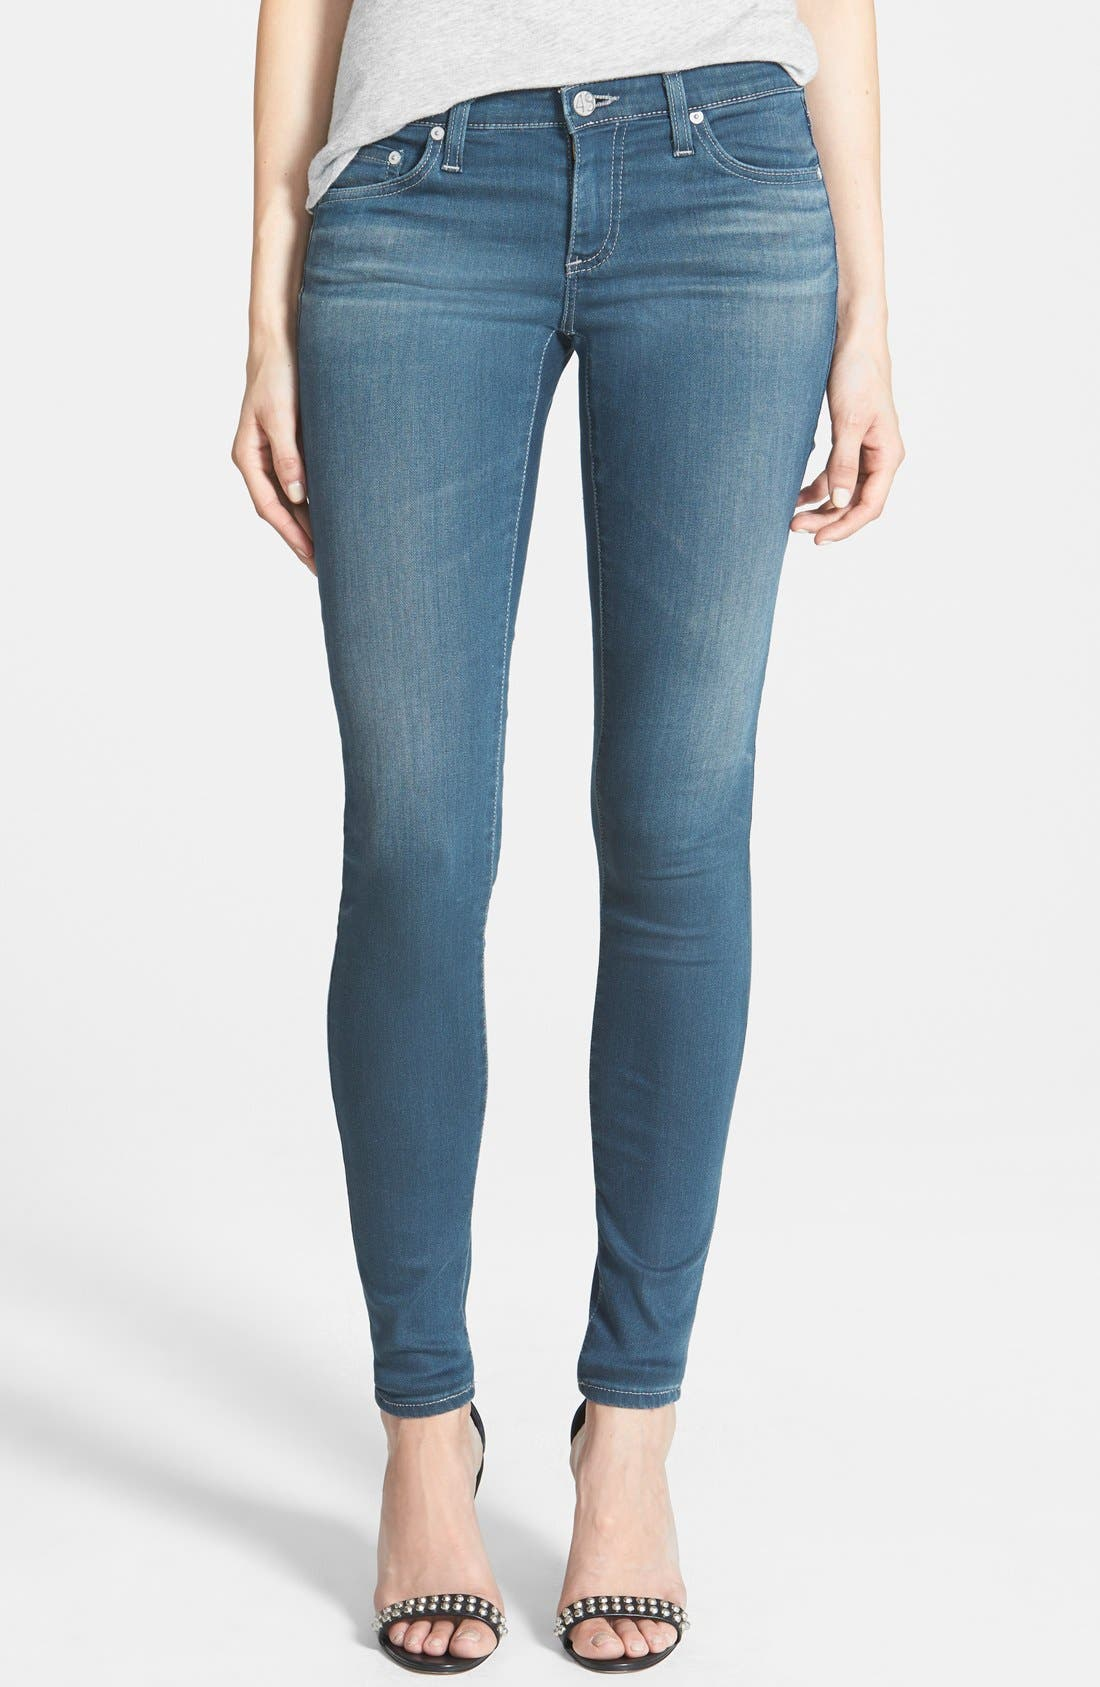 Alternate Image 1 Selected - AG 'The Legging' Skinny Jeans (3Y Windstorm)